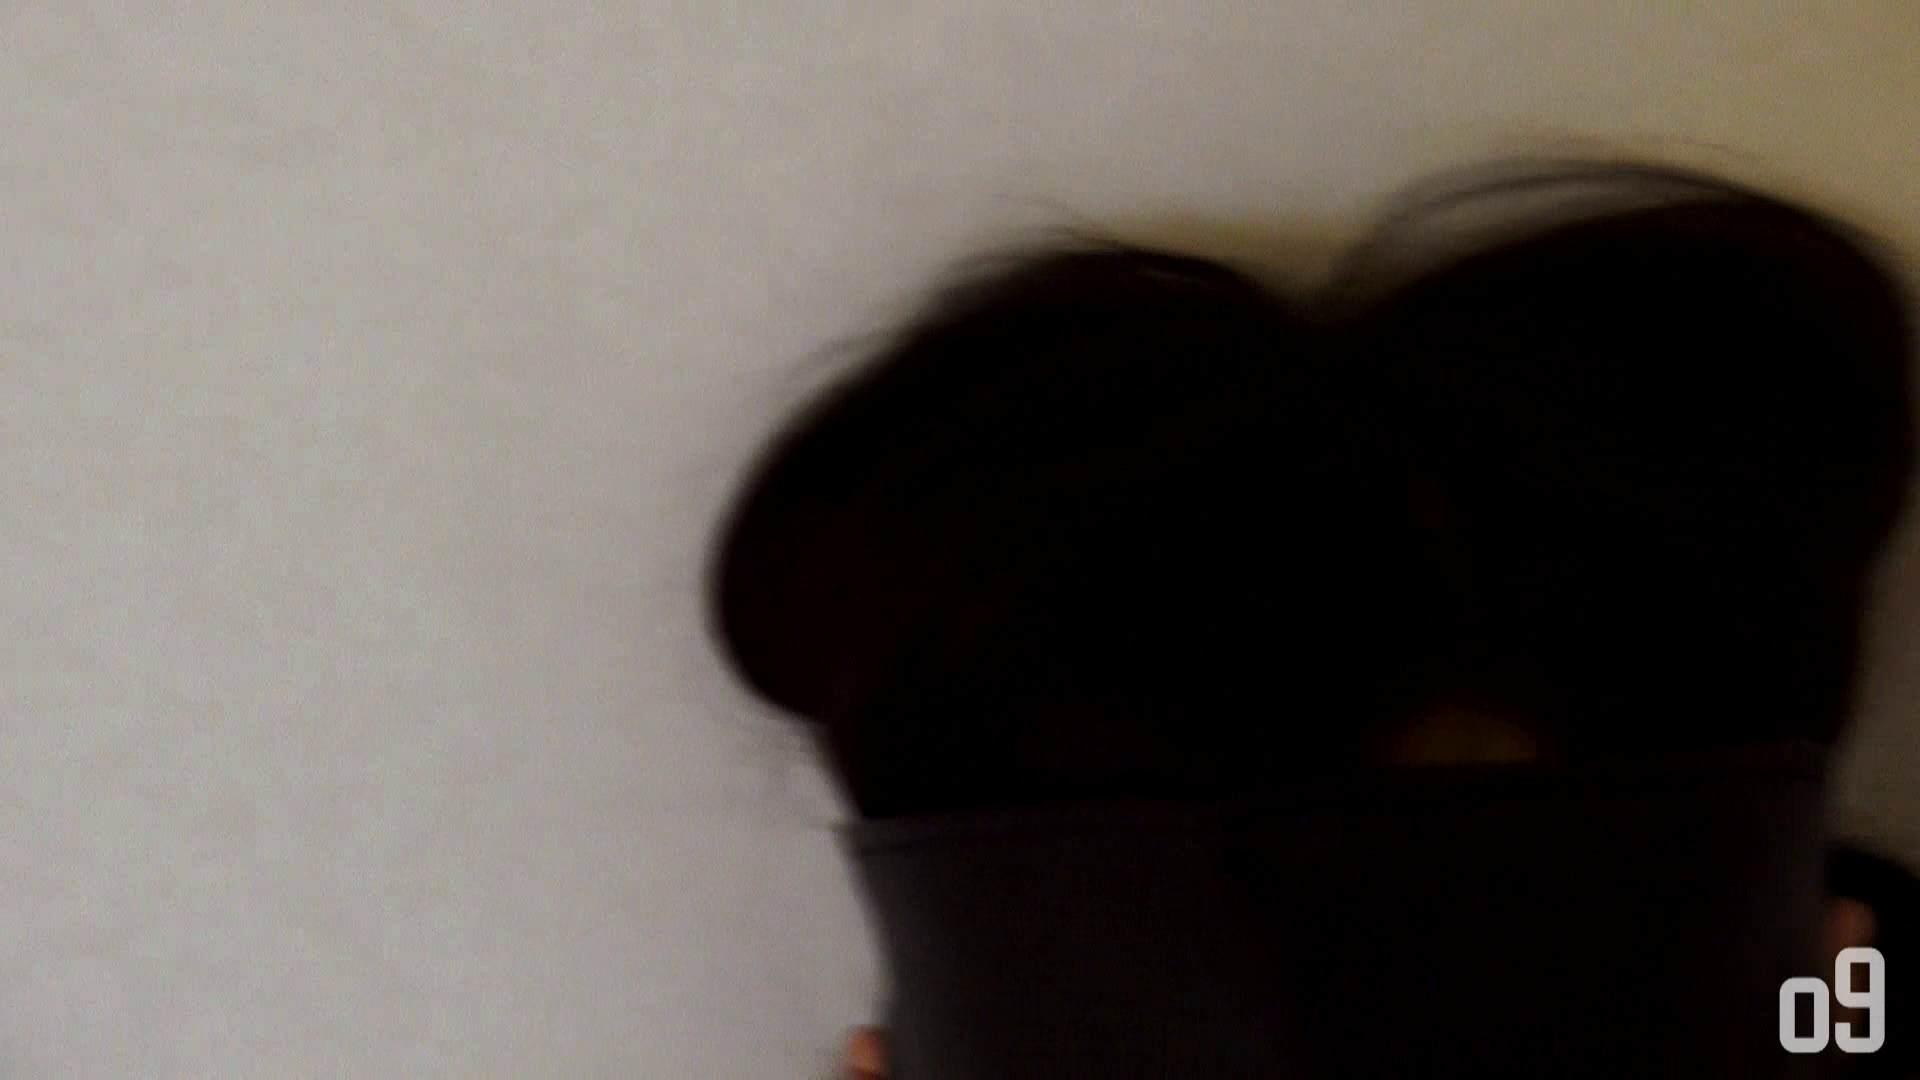 vol.6 TKSさんが震える!留華ちゃんの不慣れな手コキで念願の射精! OLハメ撮り  94Pix 51